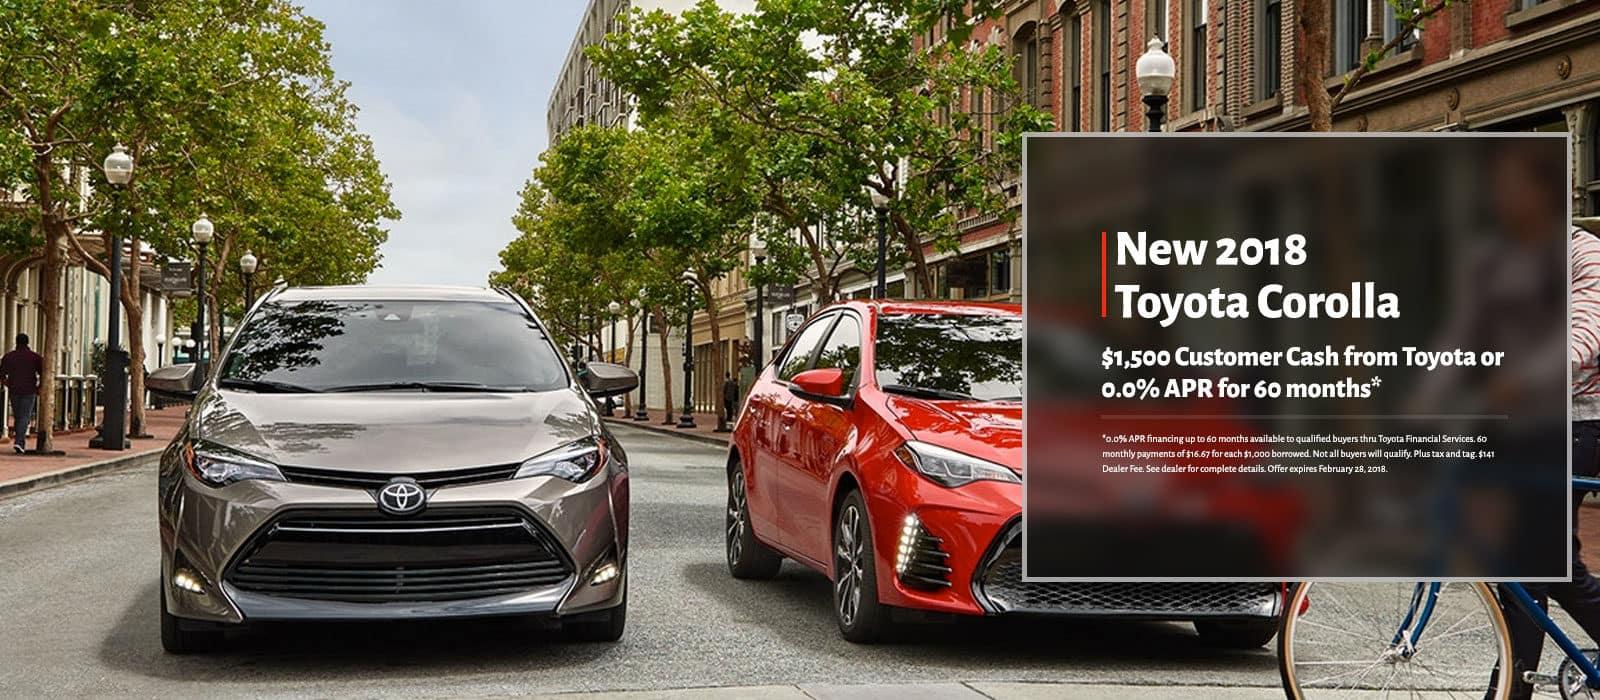 New_2018_Toyota_Corolla_Banner